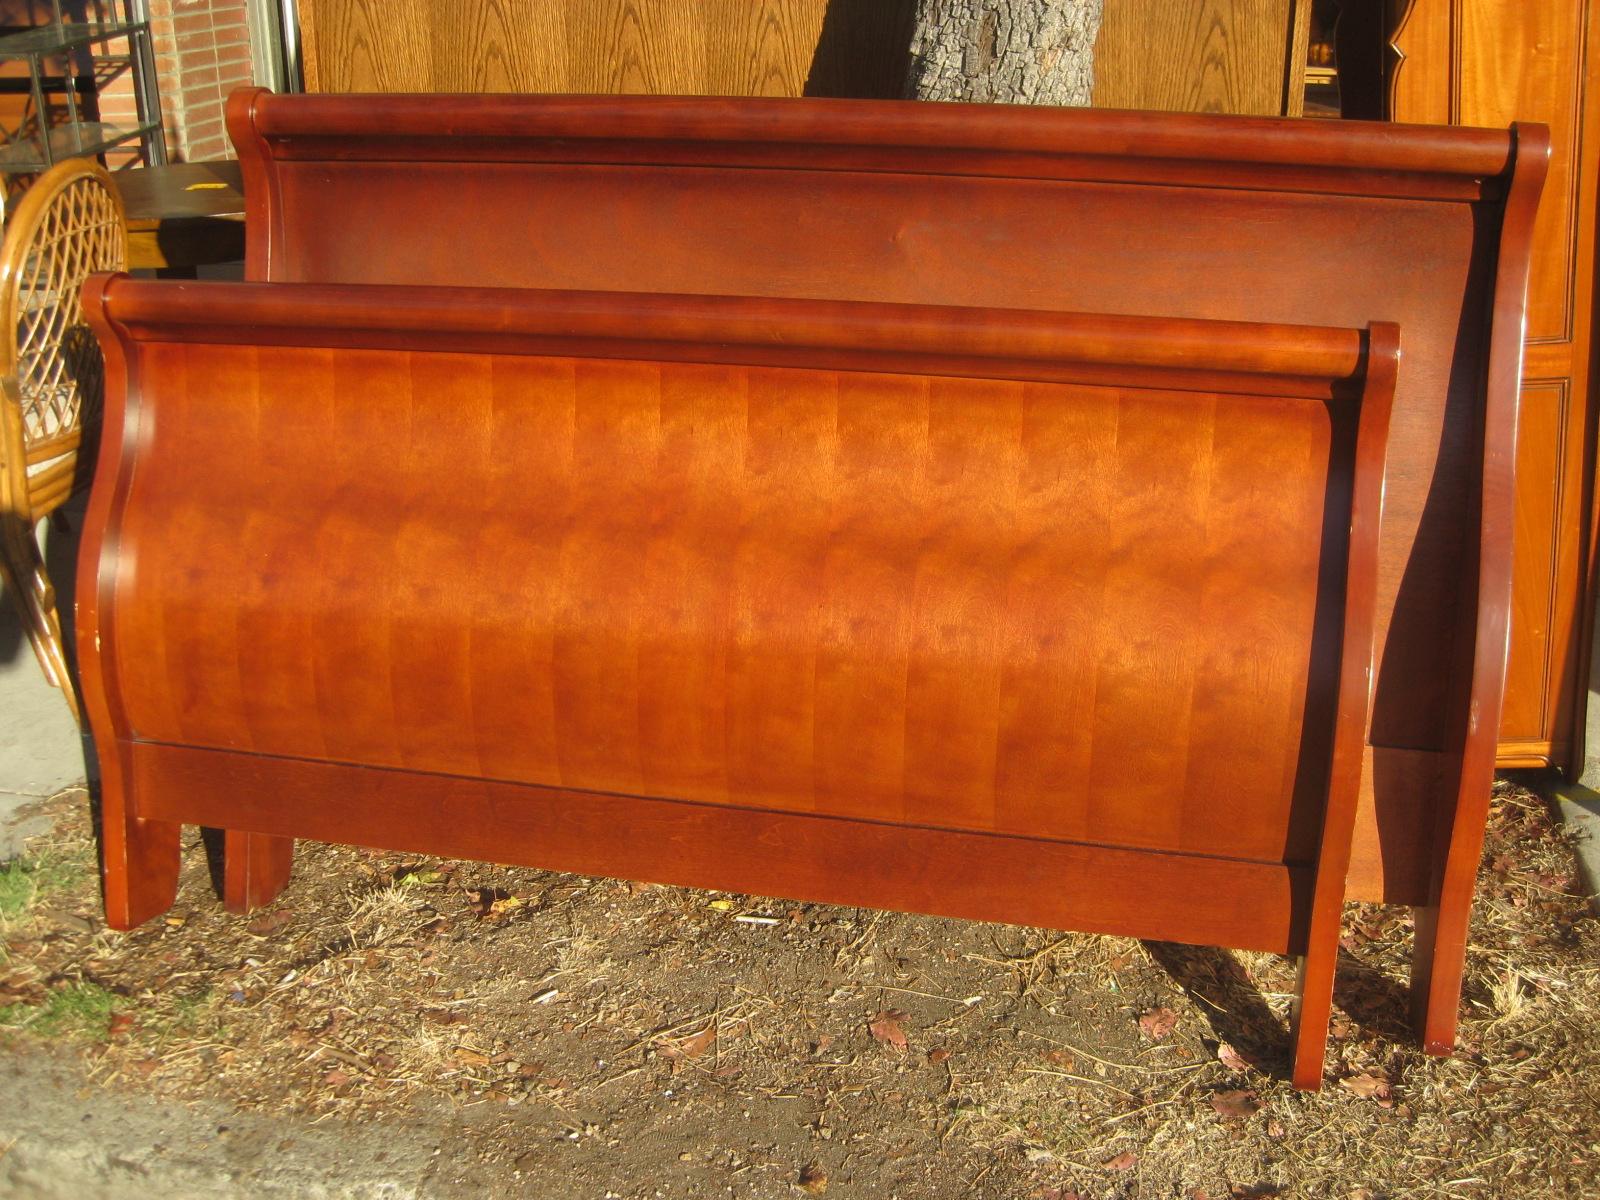 sold queen sleigh bed frame - Queen Sleigh Bed Frame